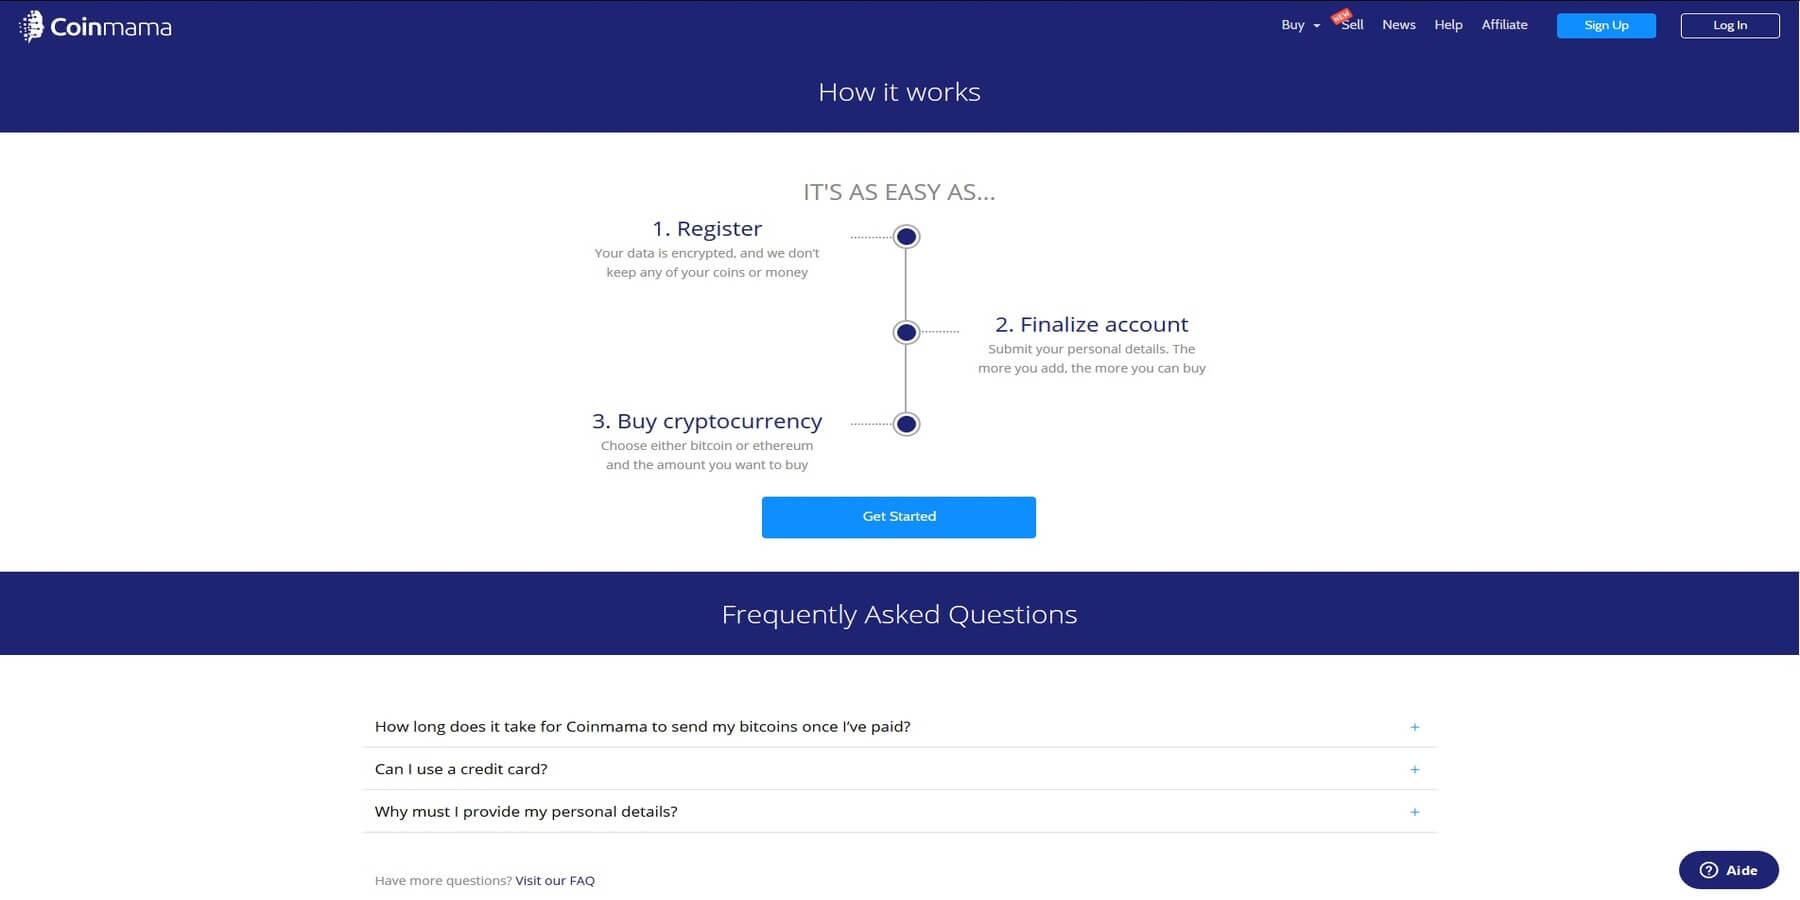 Acheter des cryptomonnaies chez Coinmama bis